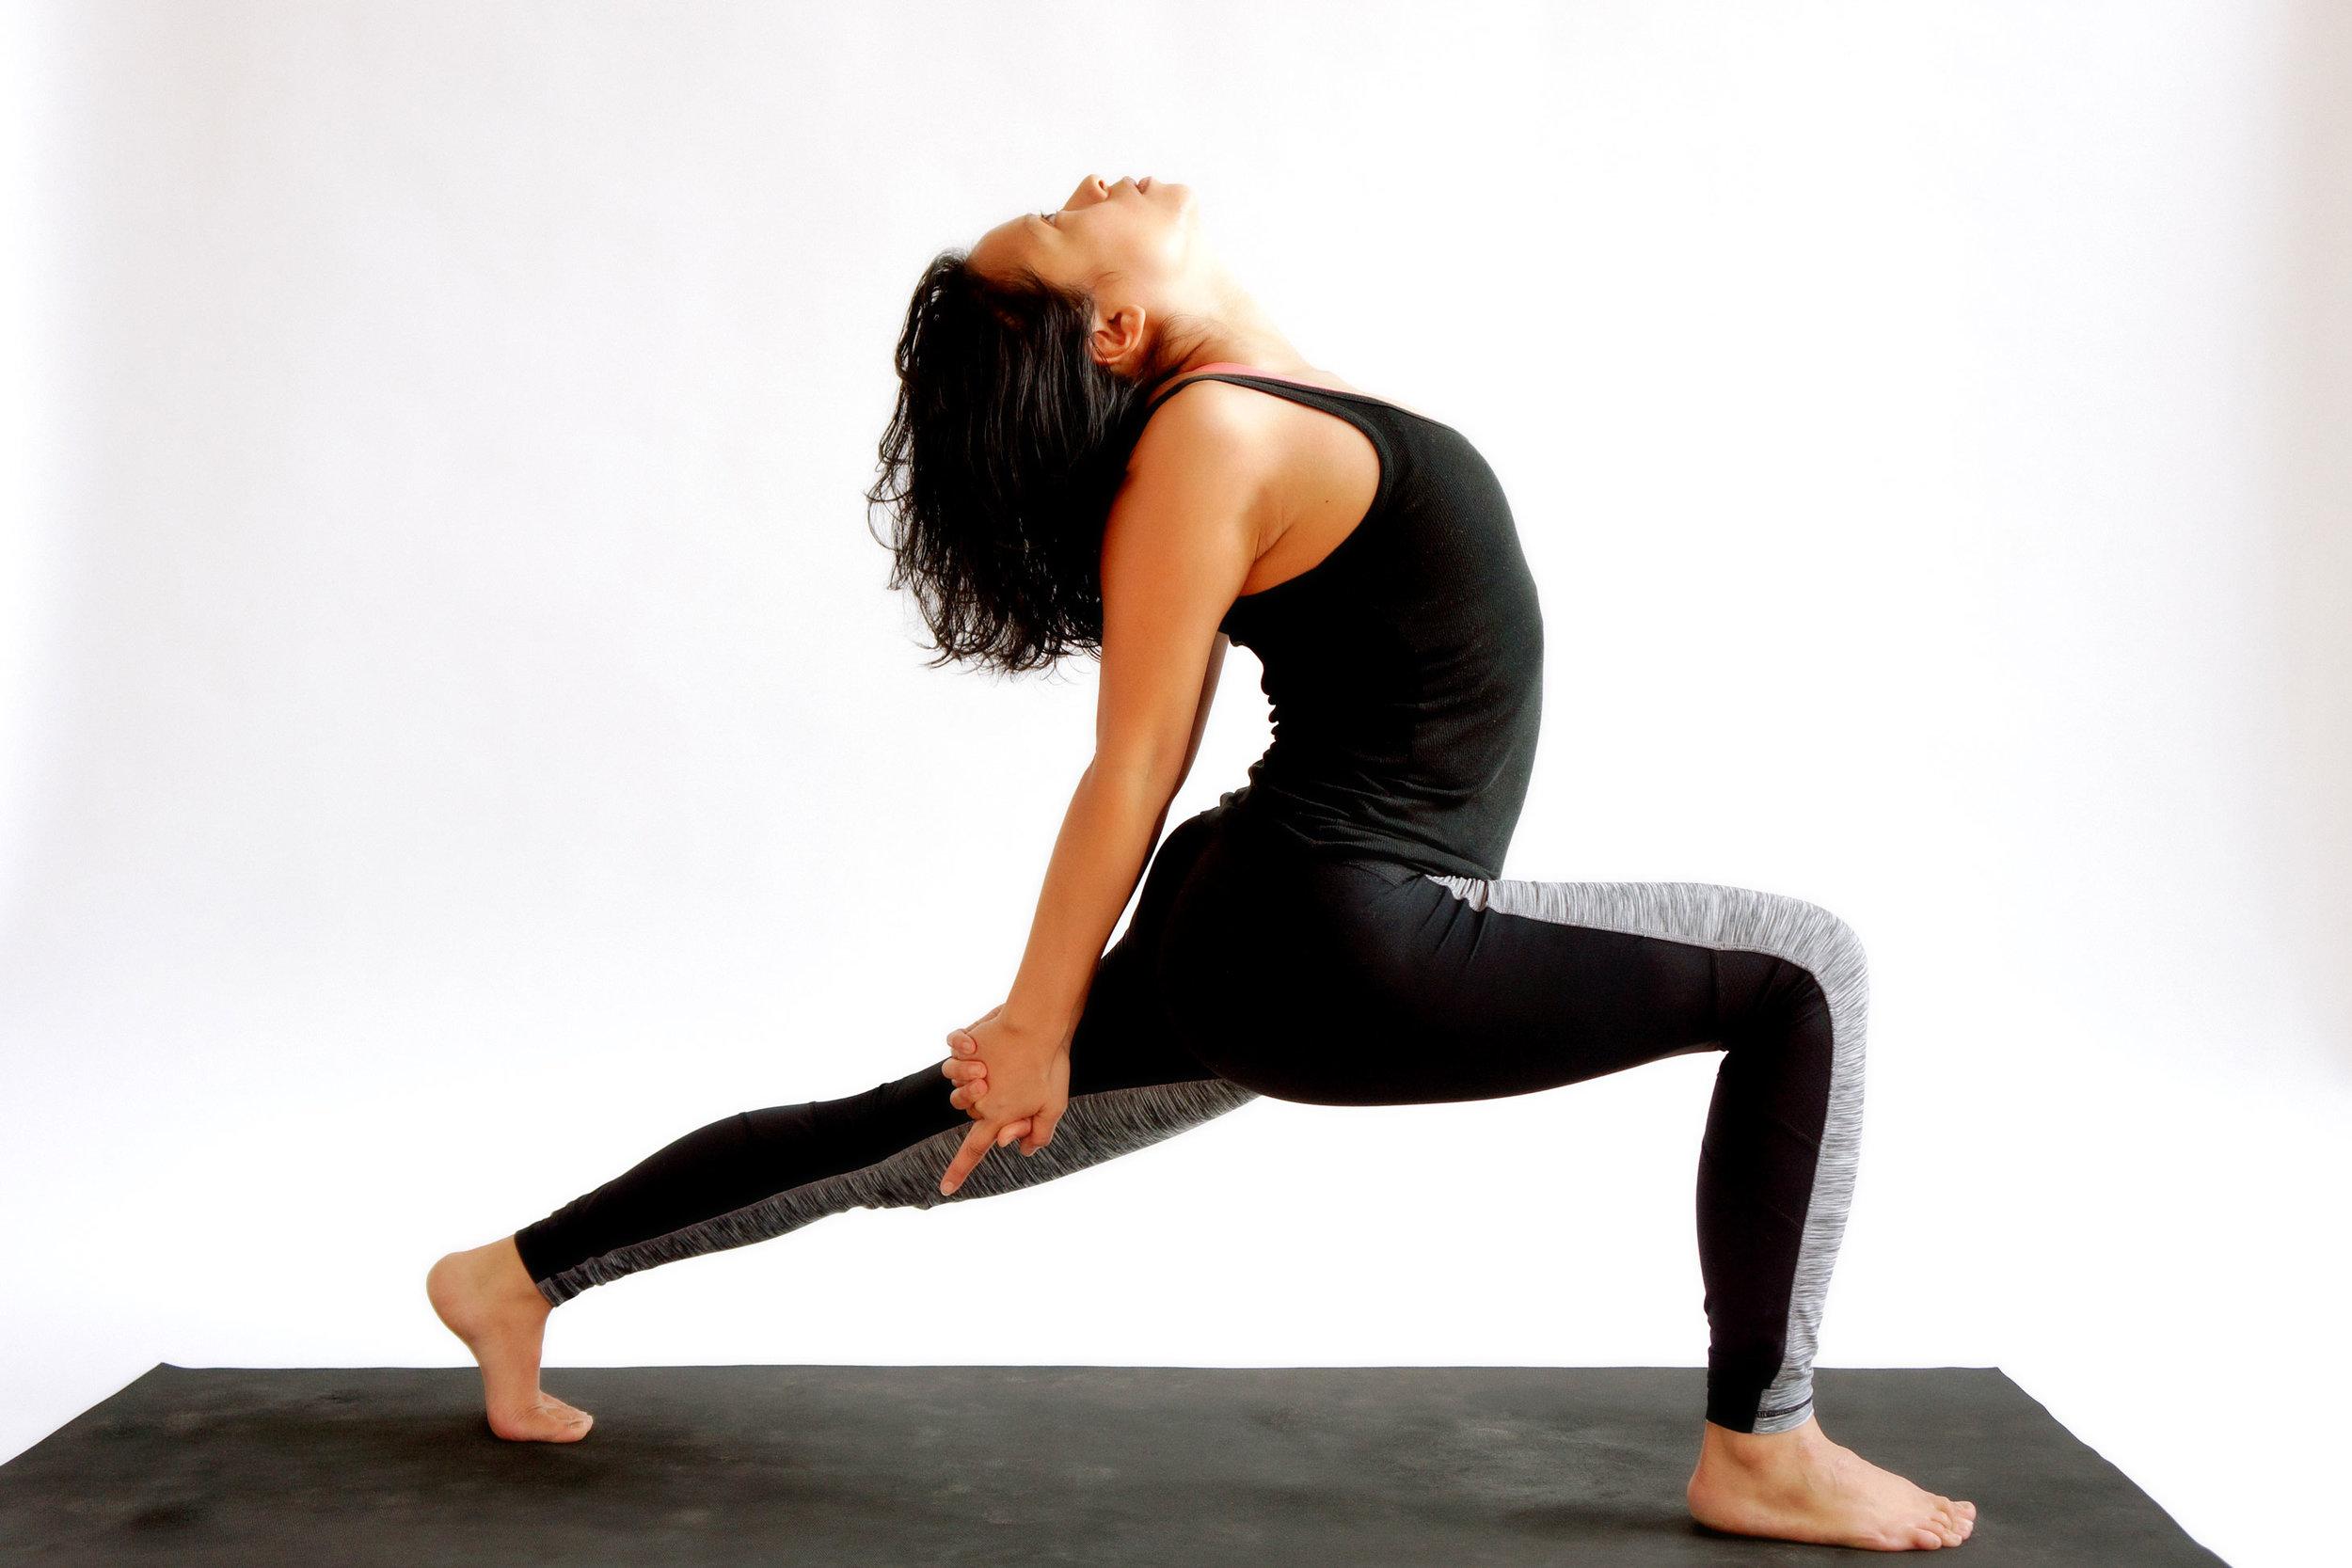 Danielle-espiritu-Yoga-Crescent-Lunge-with-backbend.jpg